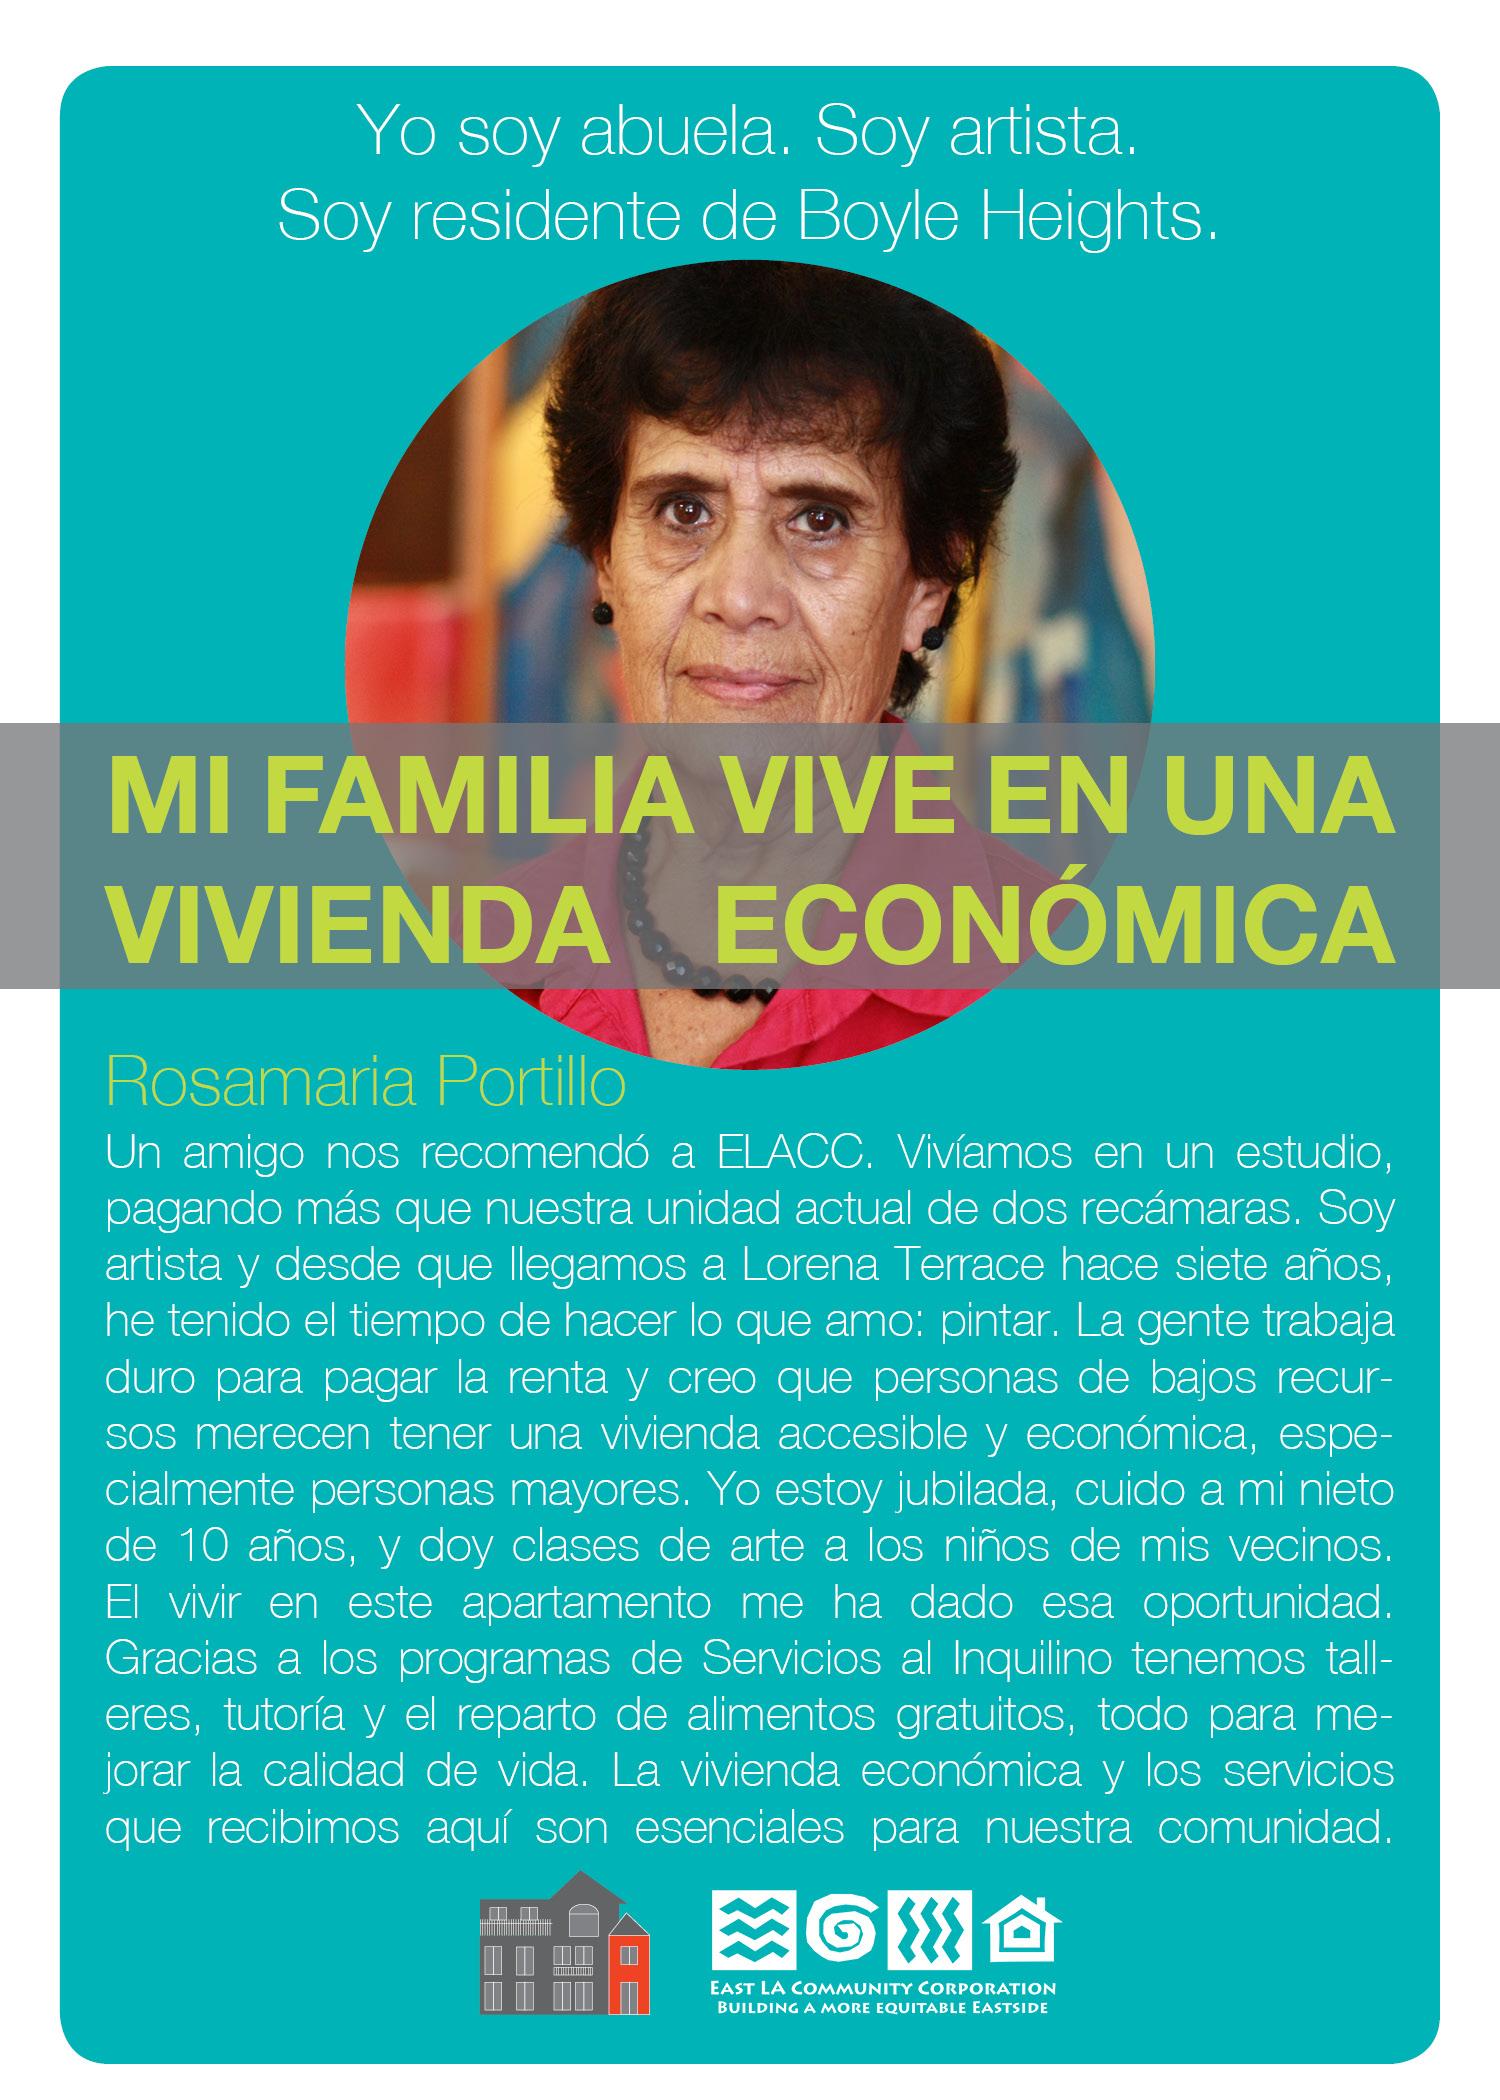 SPANISH_Live_in_Affordable_Housing-Rosamaria-_JPEG.jpg